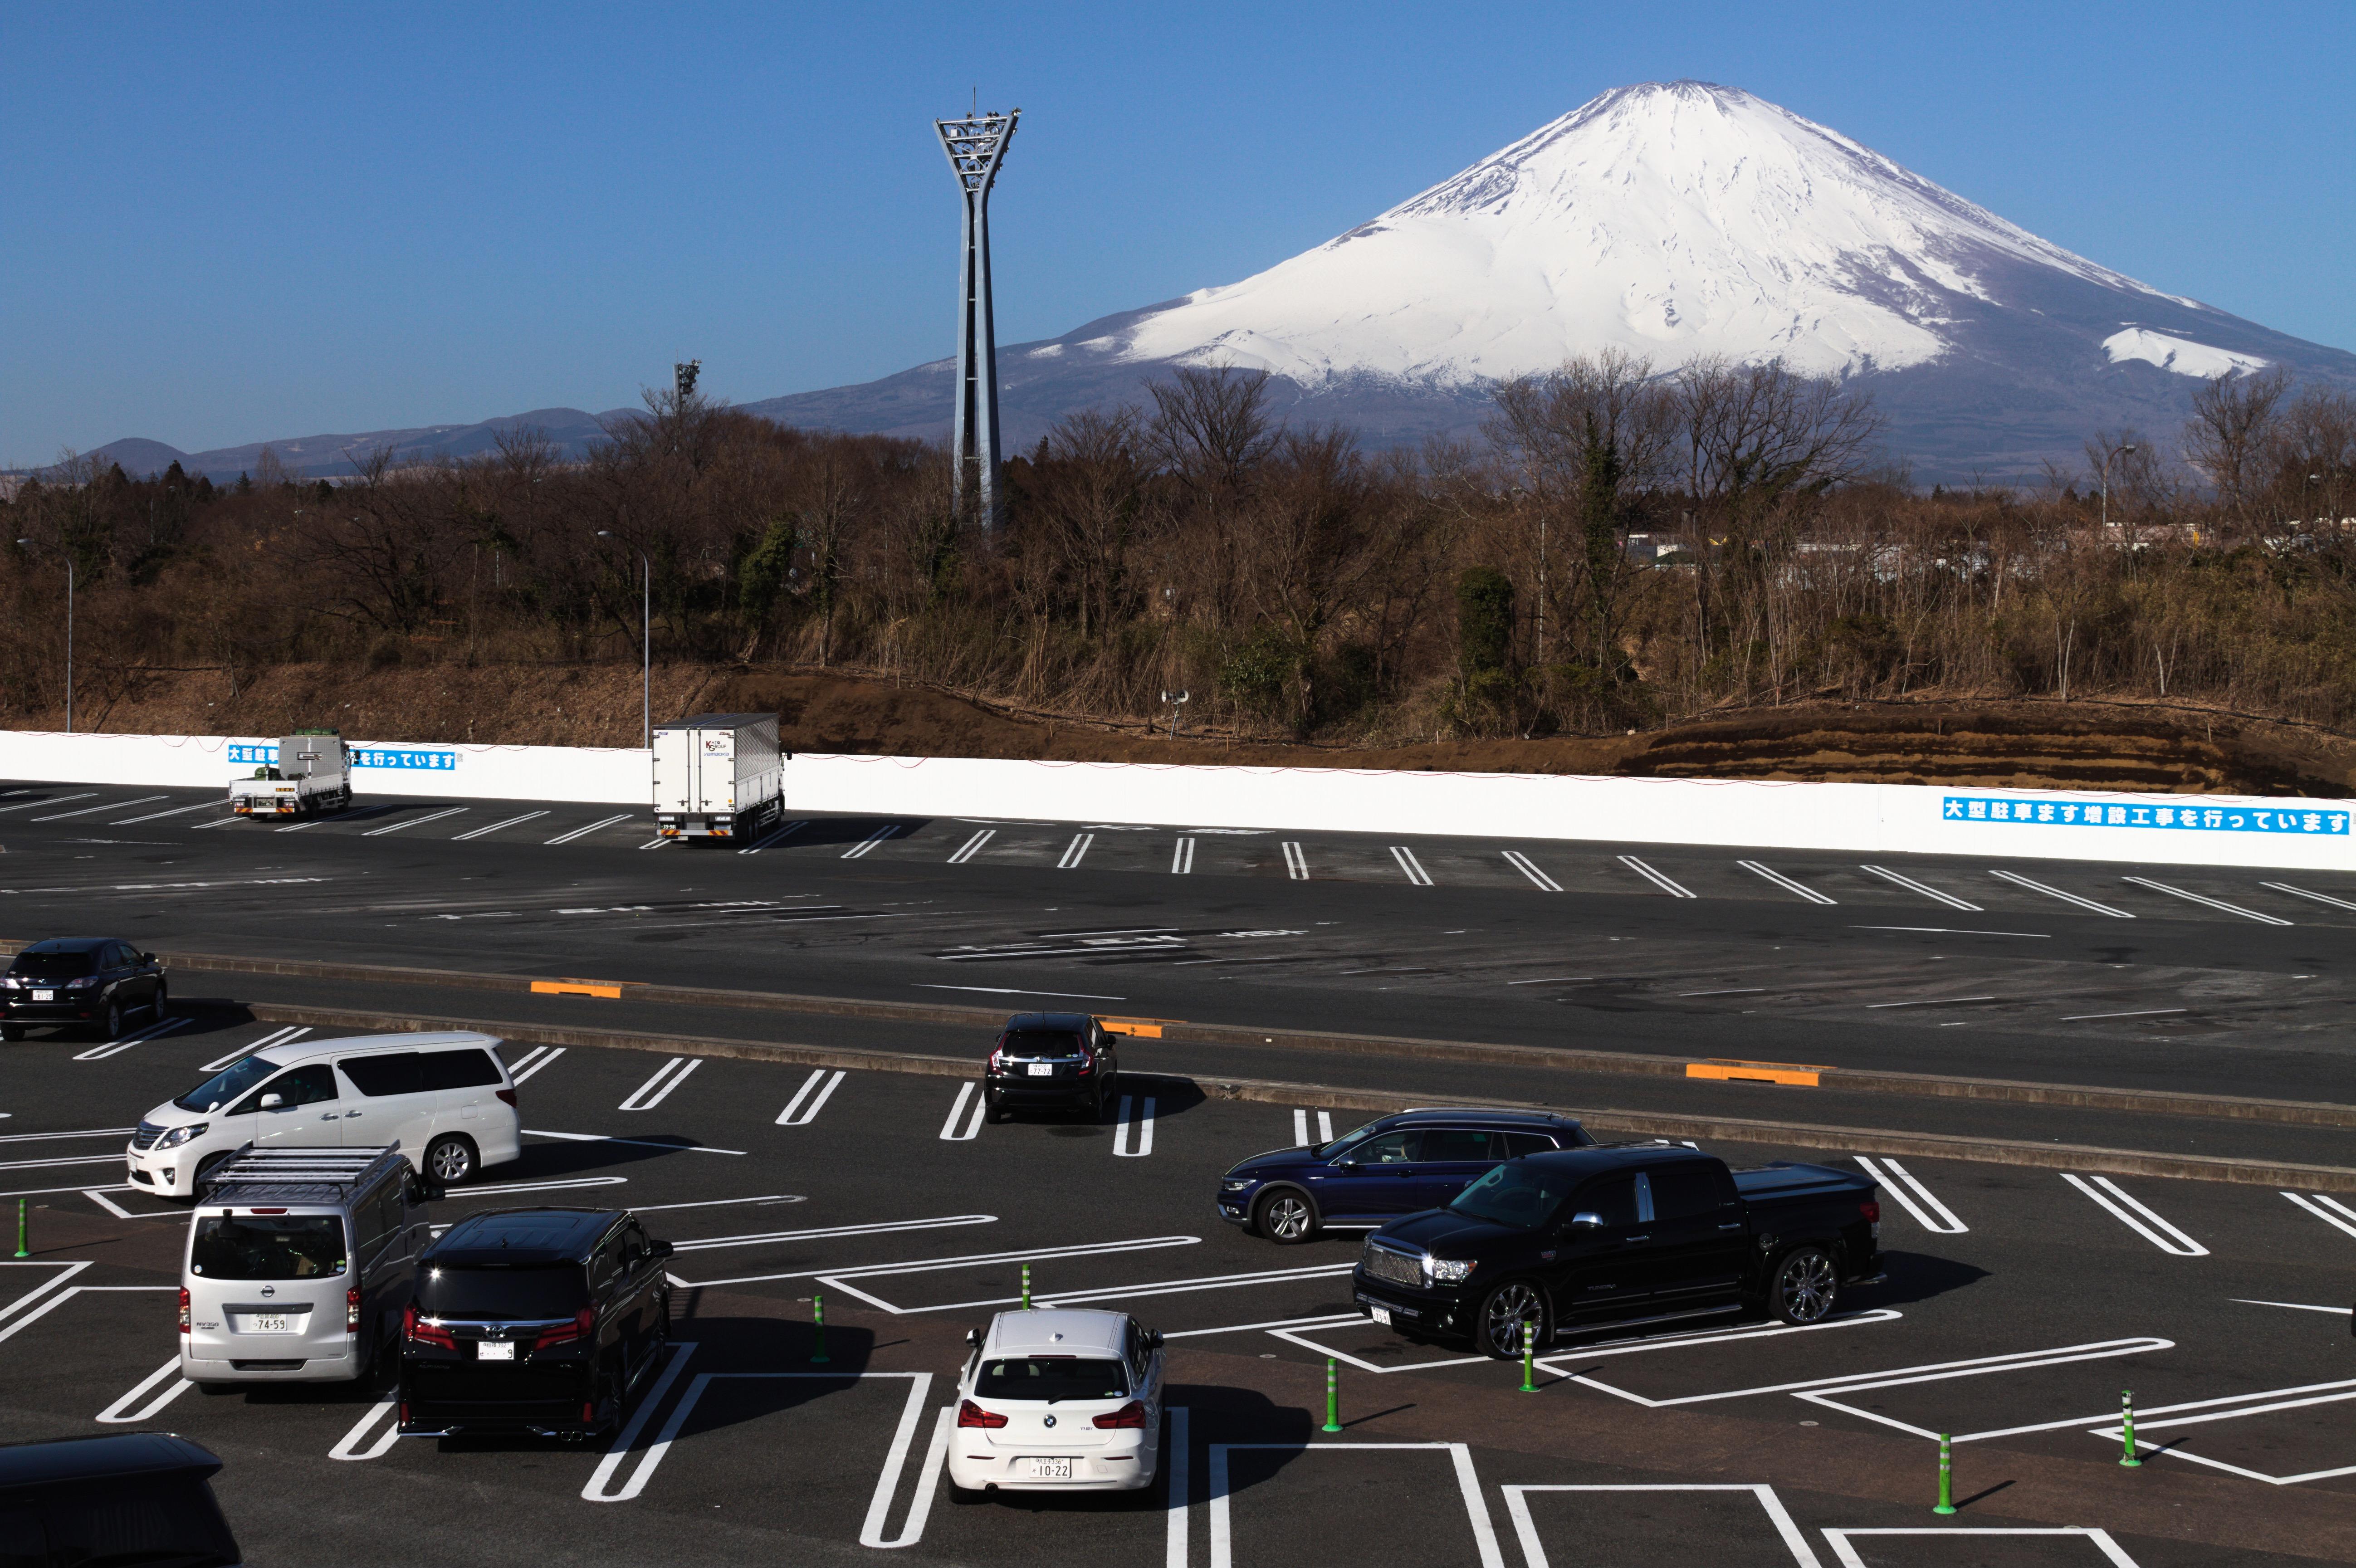 f:id:shinanoarai64:20210214162151j:plain